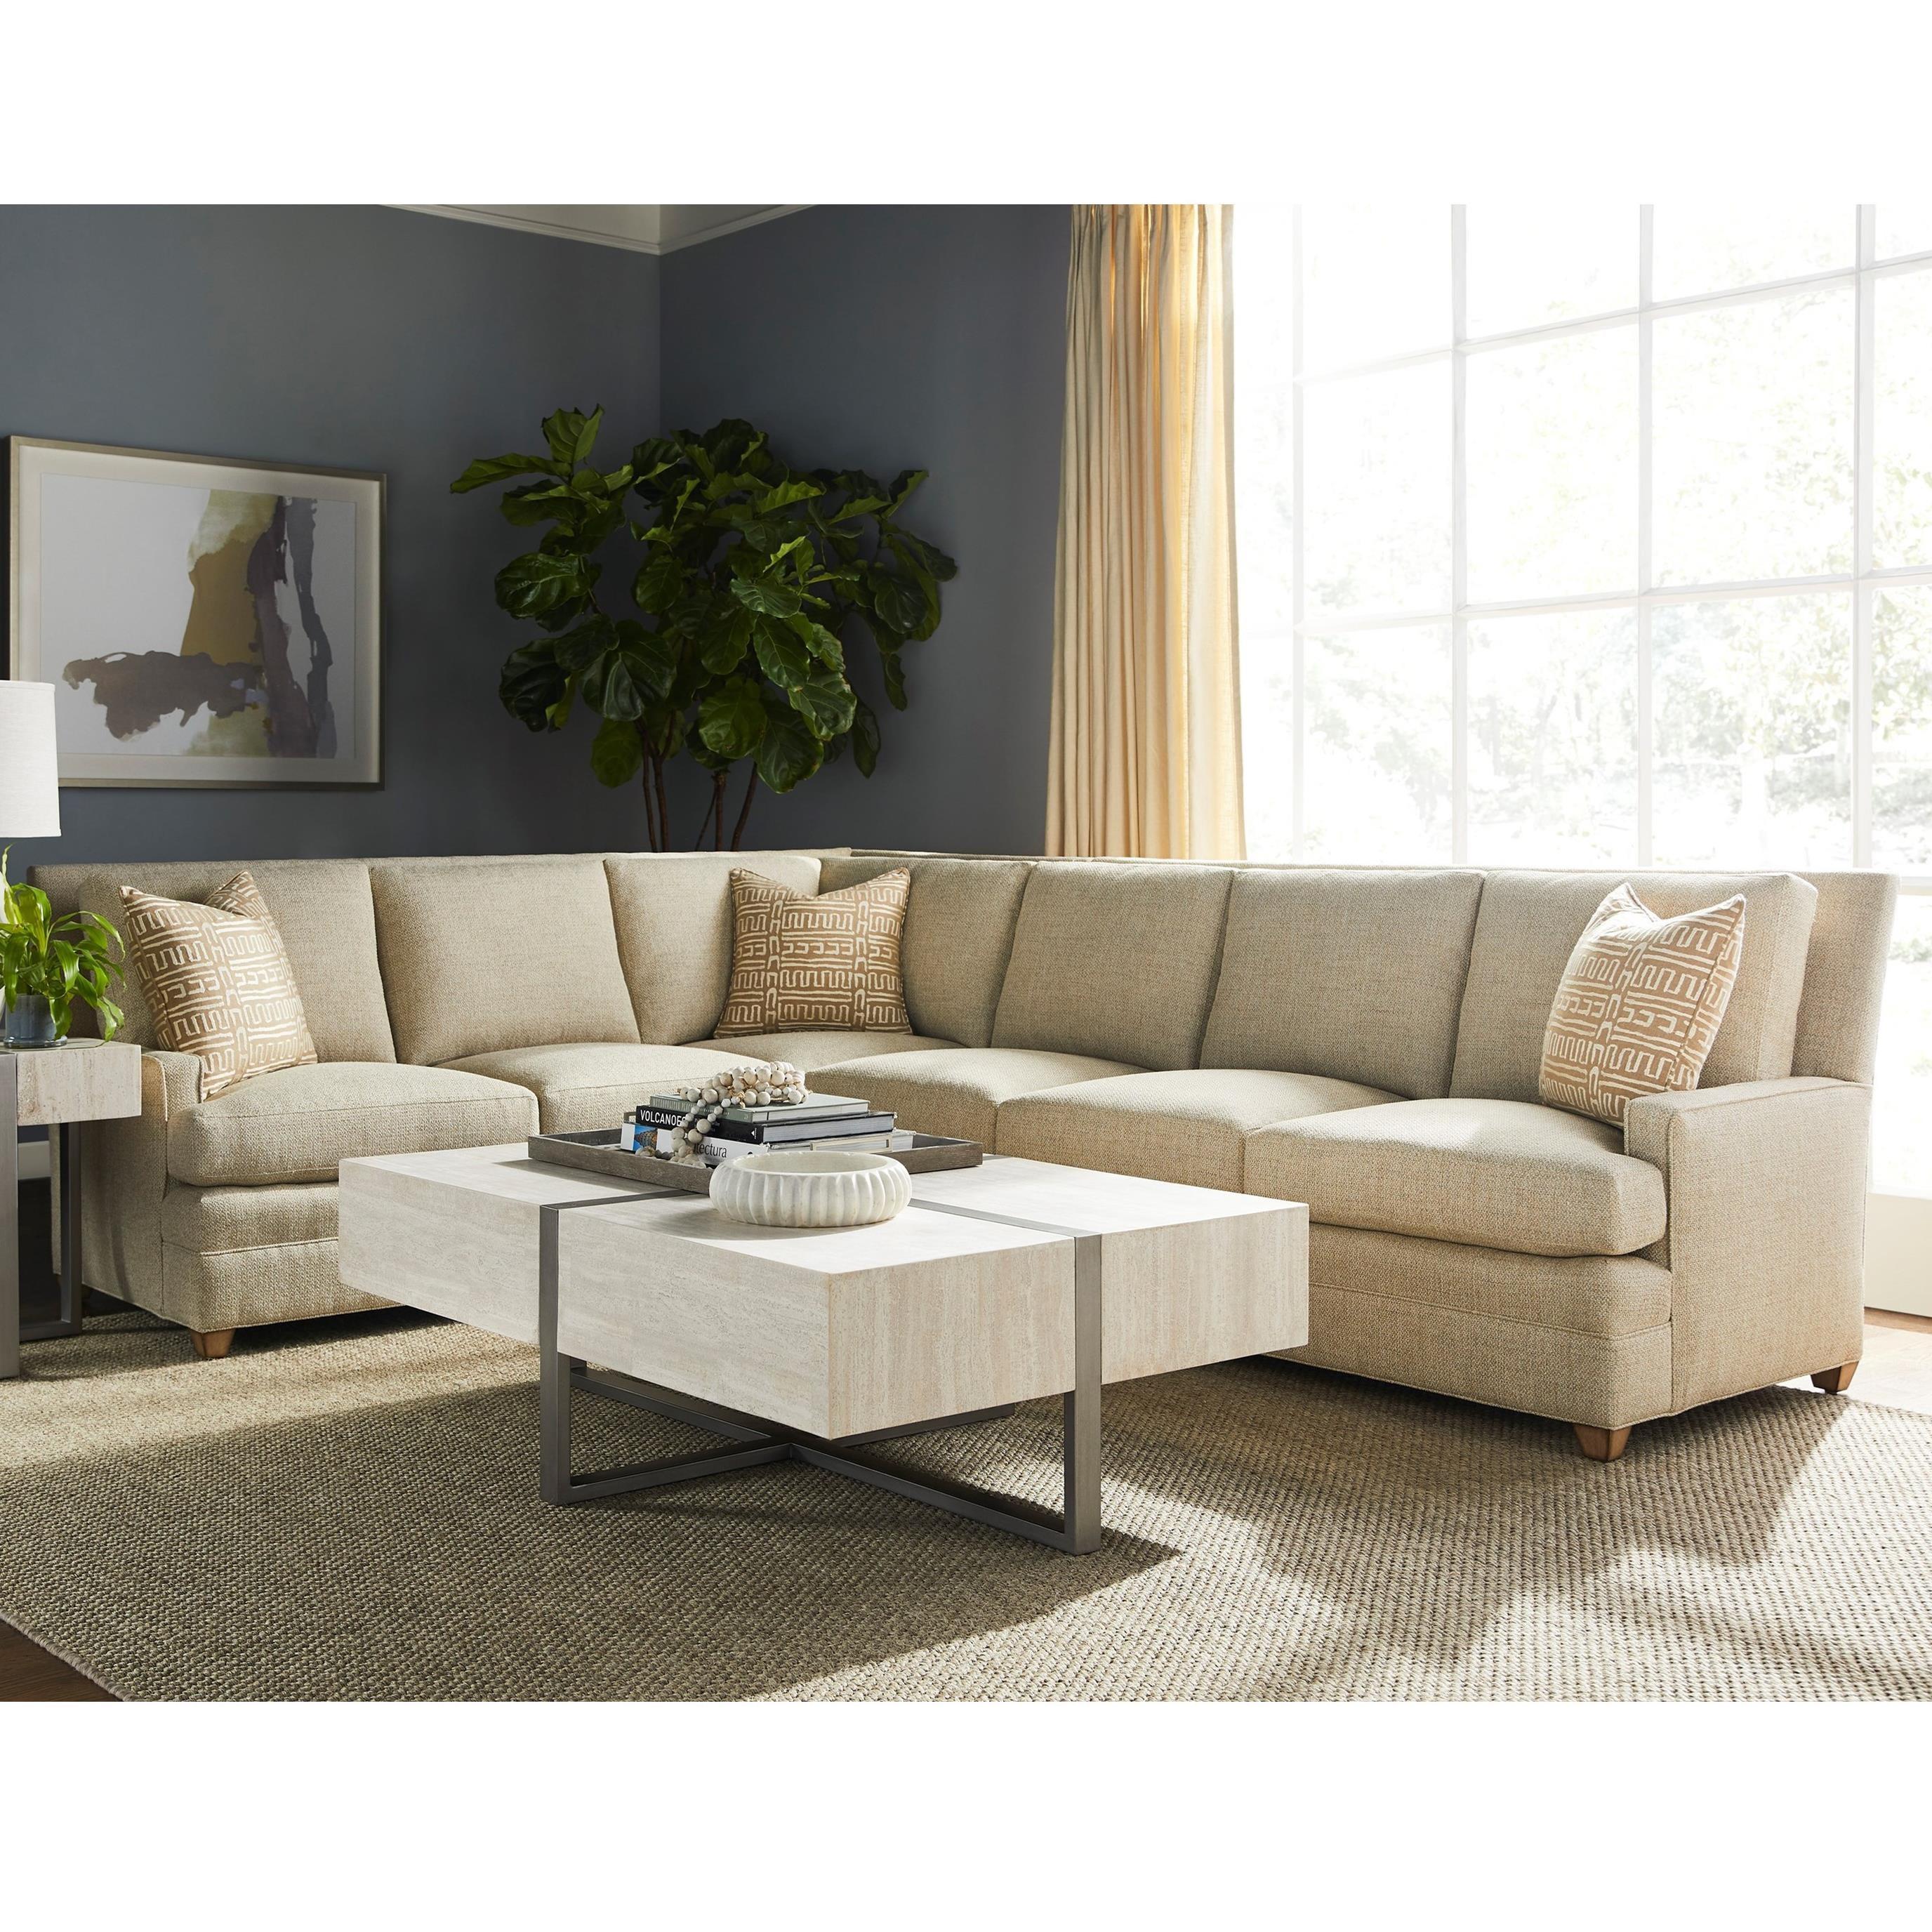 American Bungalow Riverside Sectional Sofa by Vanguard Furniture at Baer's Furniture